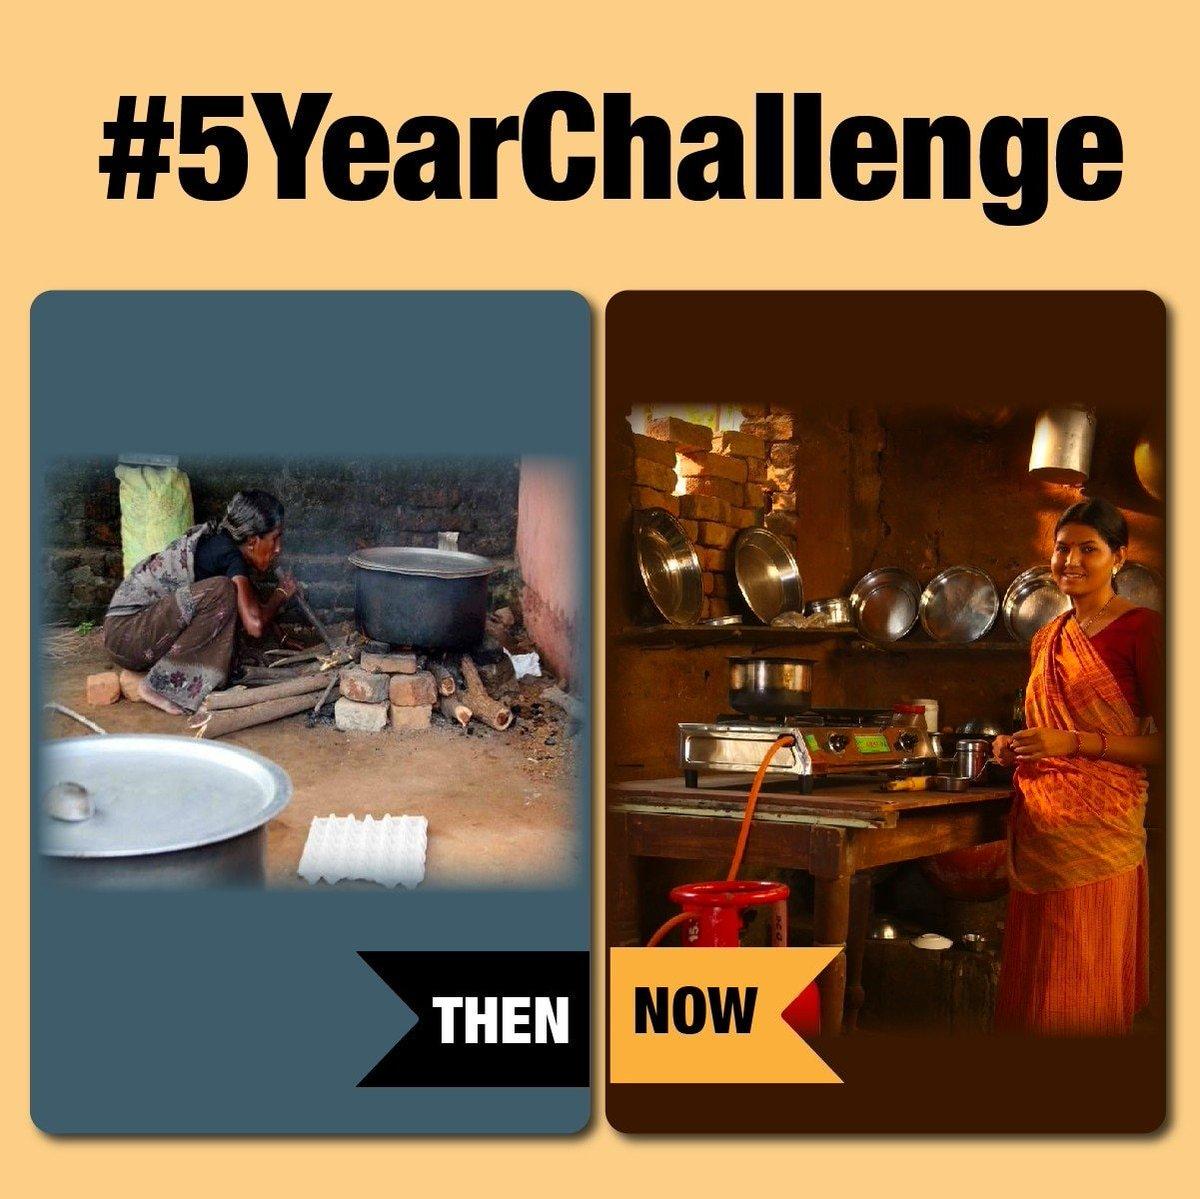 #5YearChallenge #5YearChallenge via NaMo App  @narendramodi